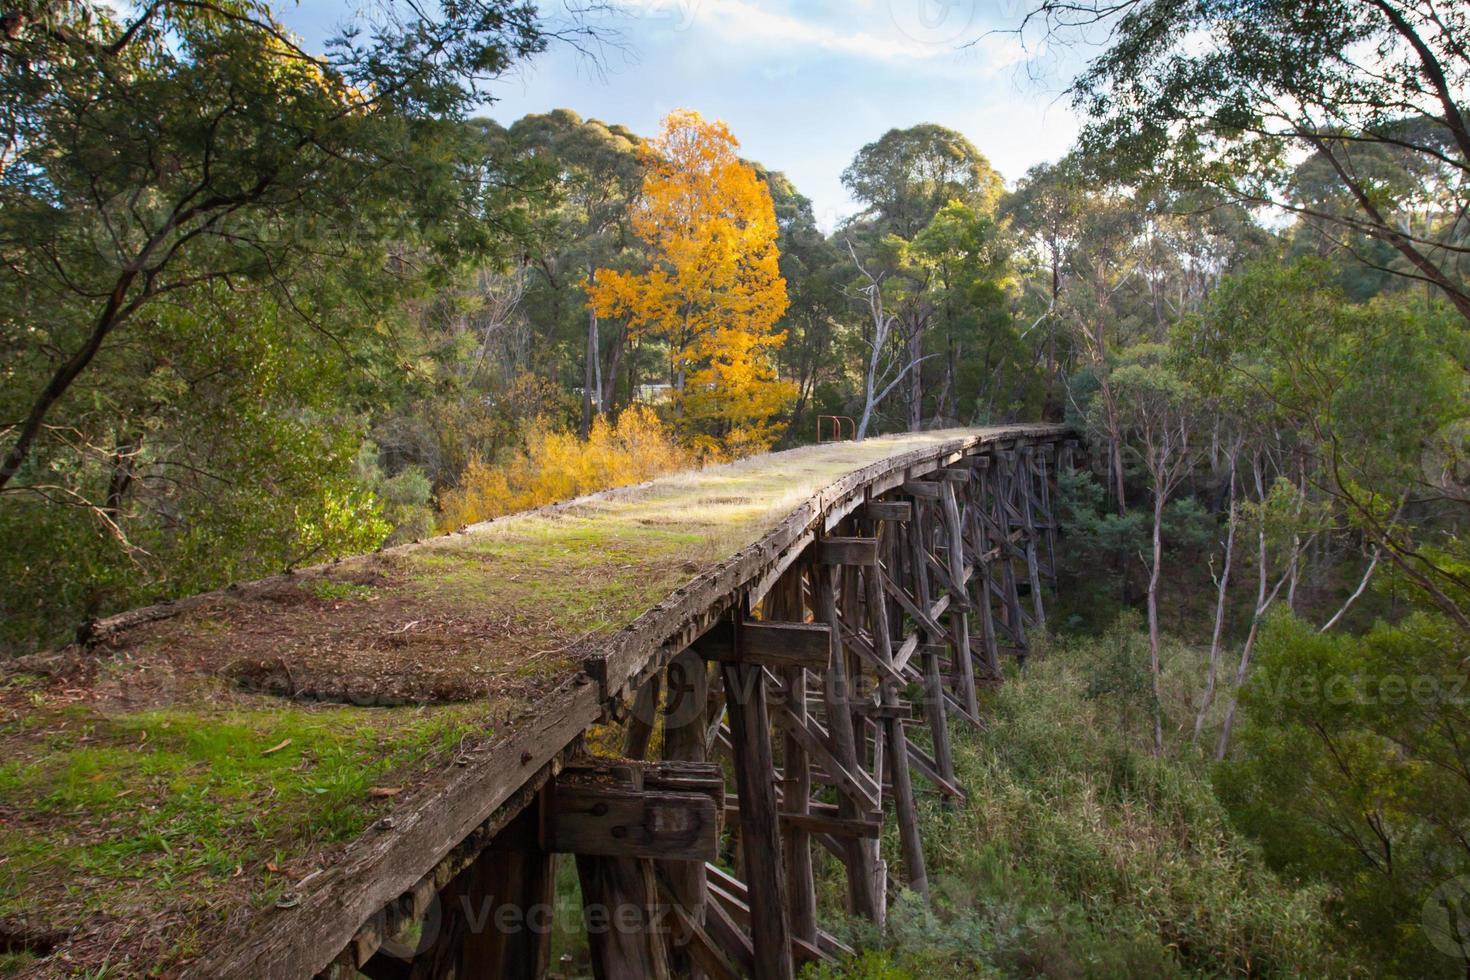 Vieux pont à chevalets à koetong photo